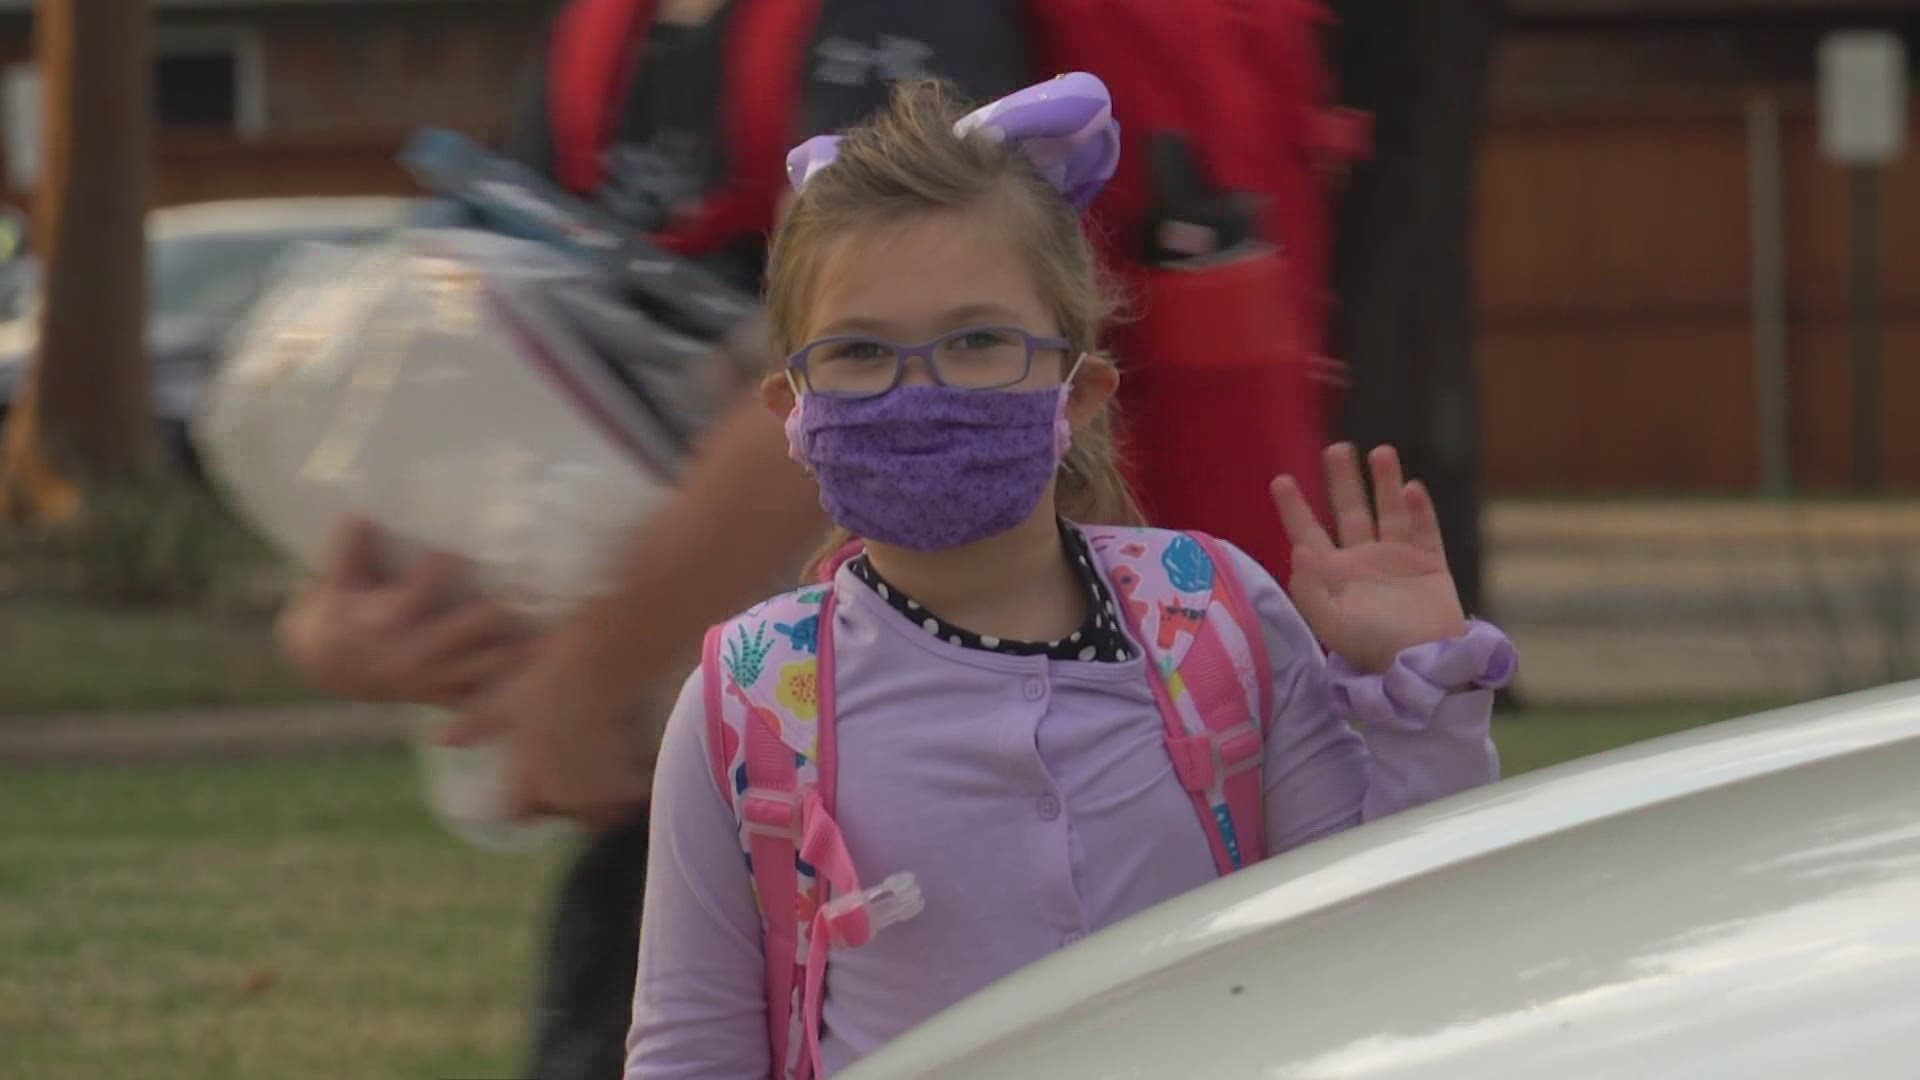 Pro-Mask Mandate Parents in Allen ISD Re-file Federal Lawsuit